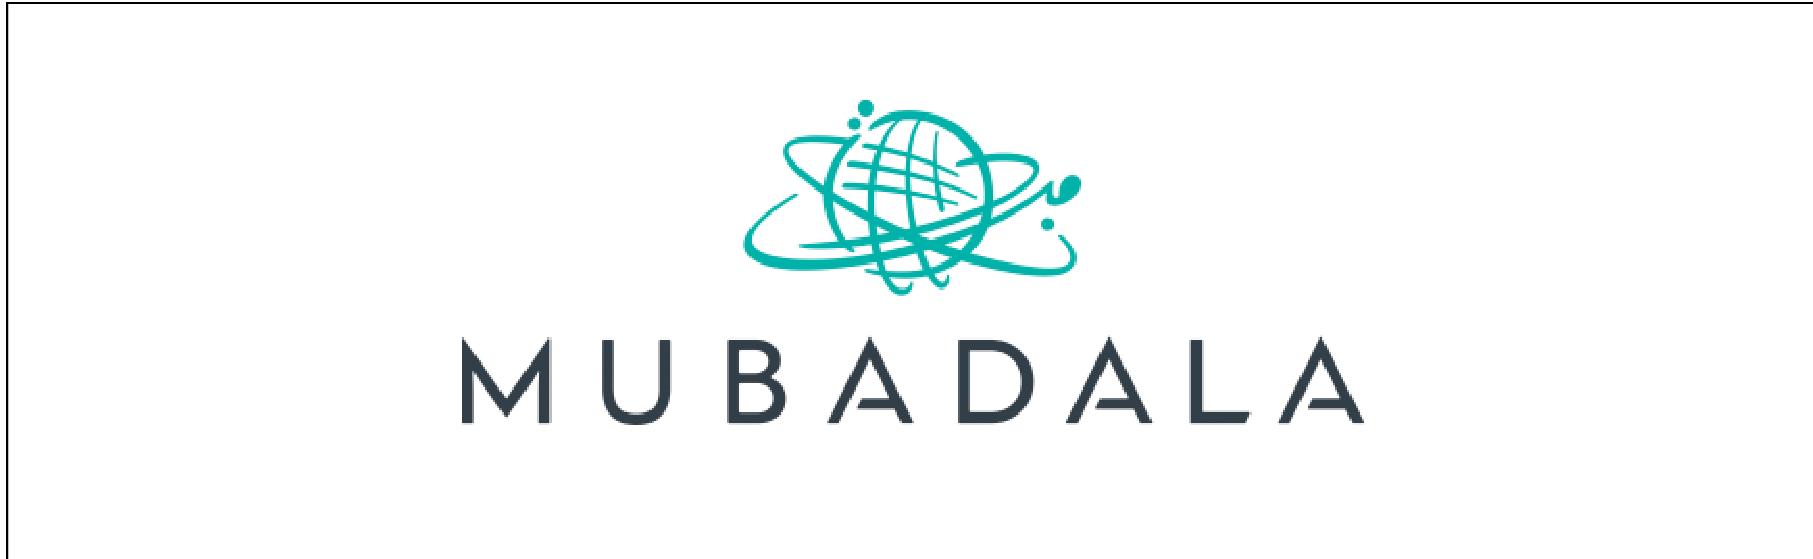 MUBADALA - INVESTMENT IN THE UK